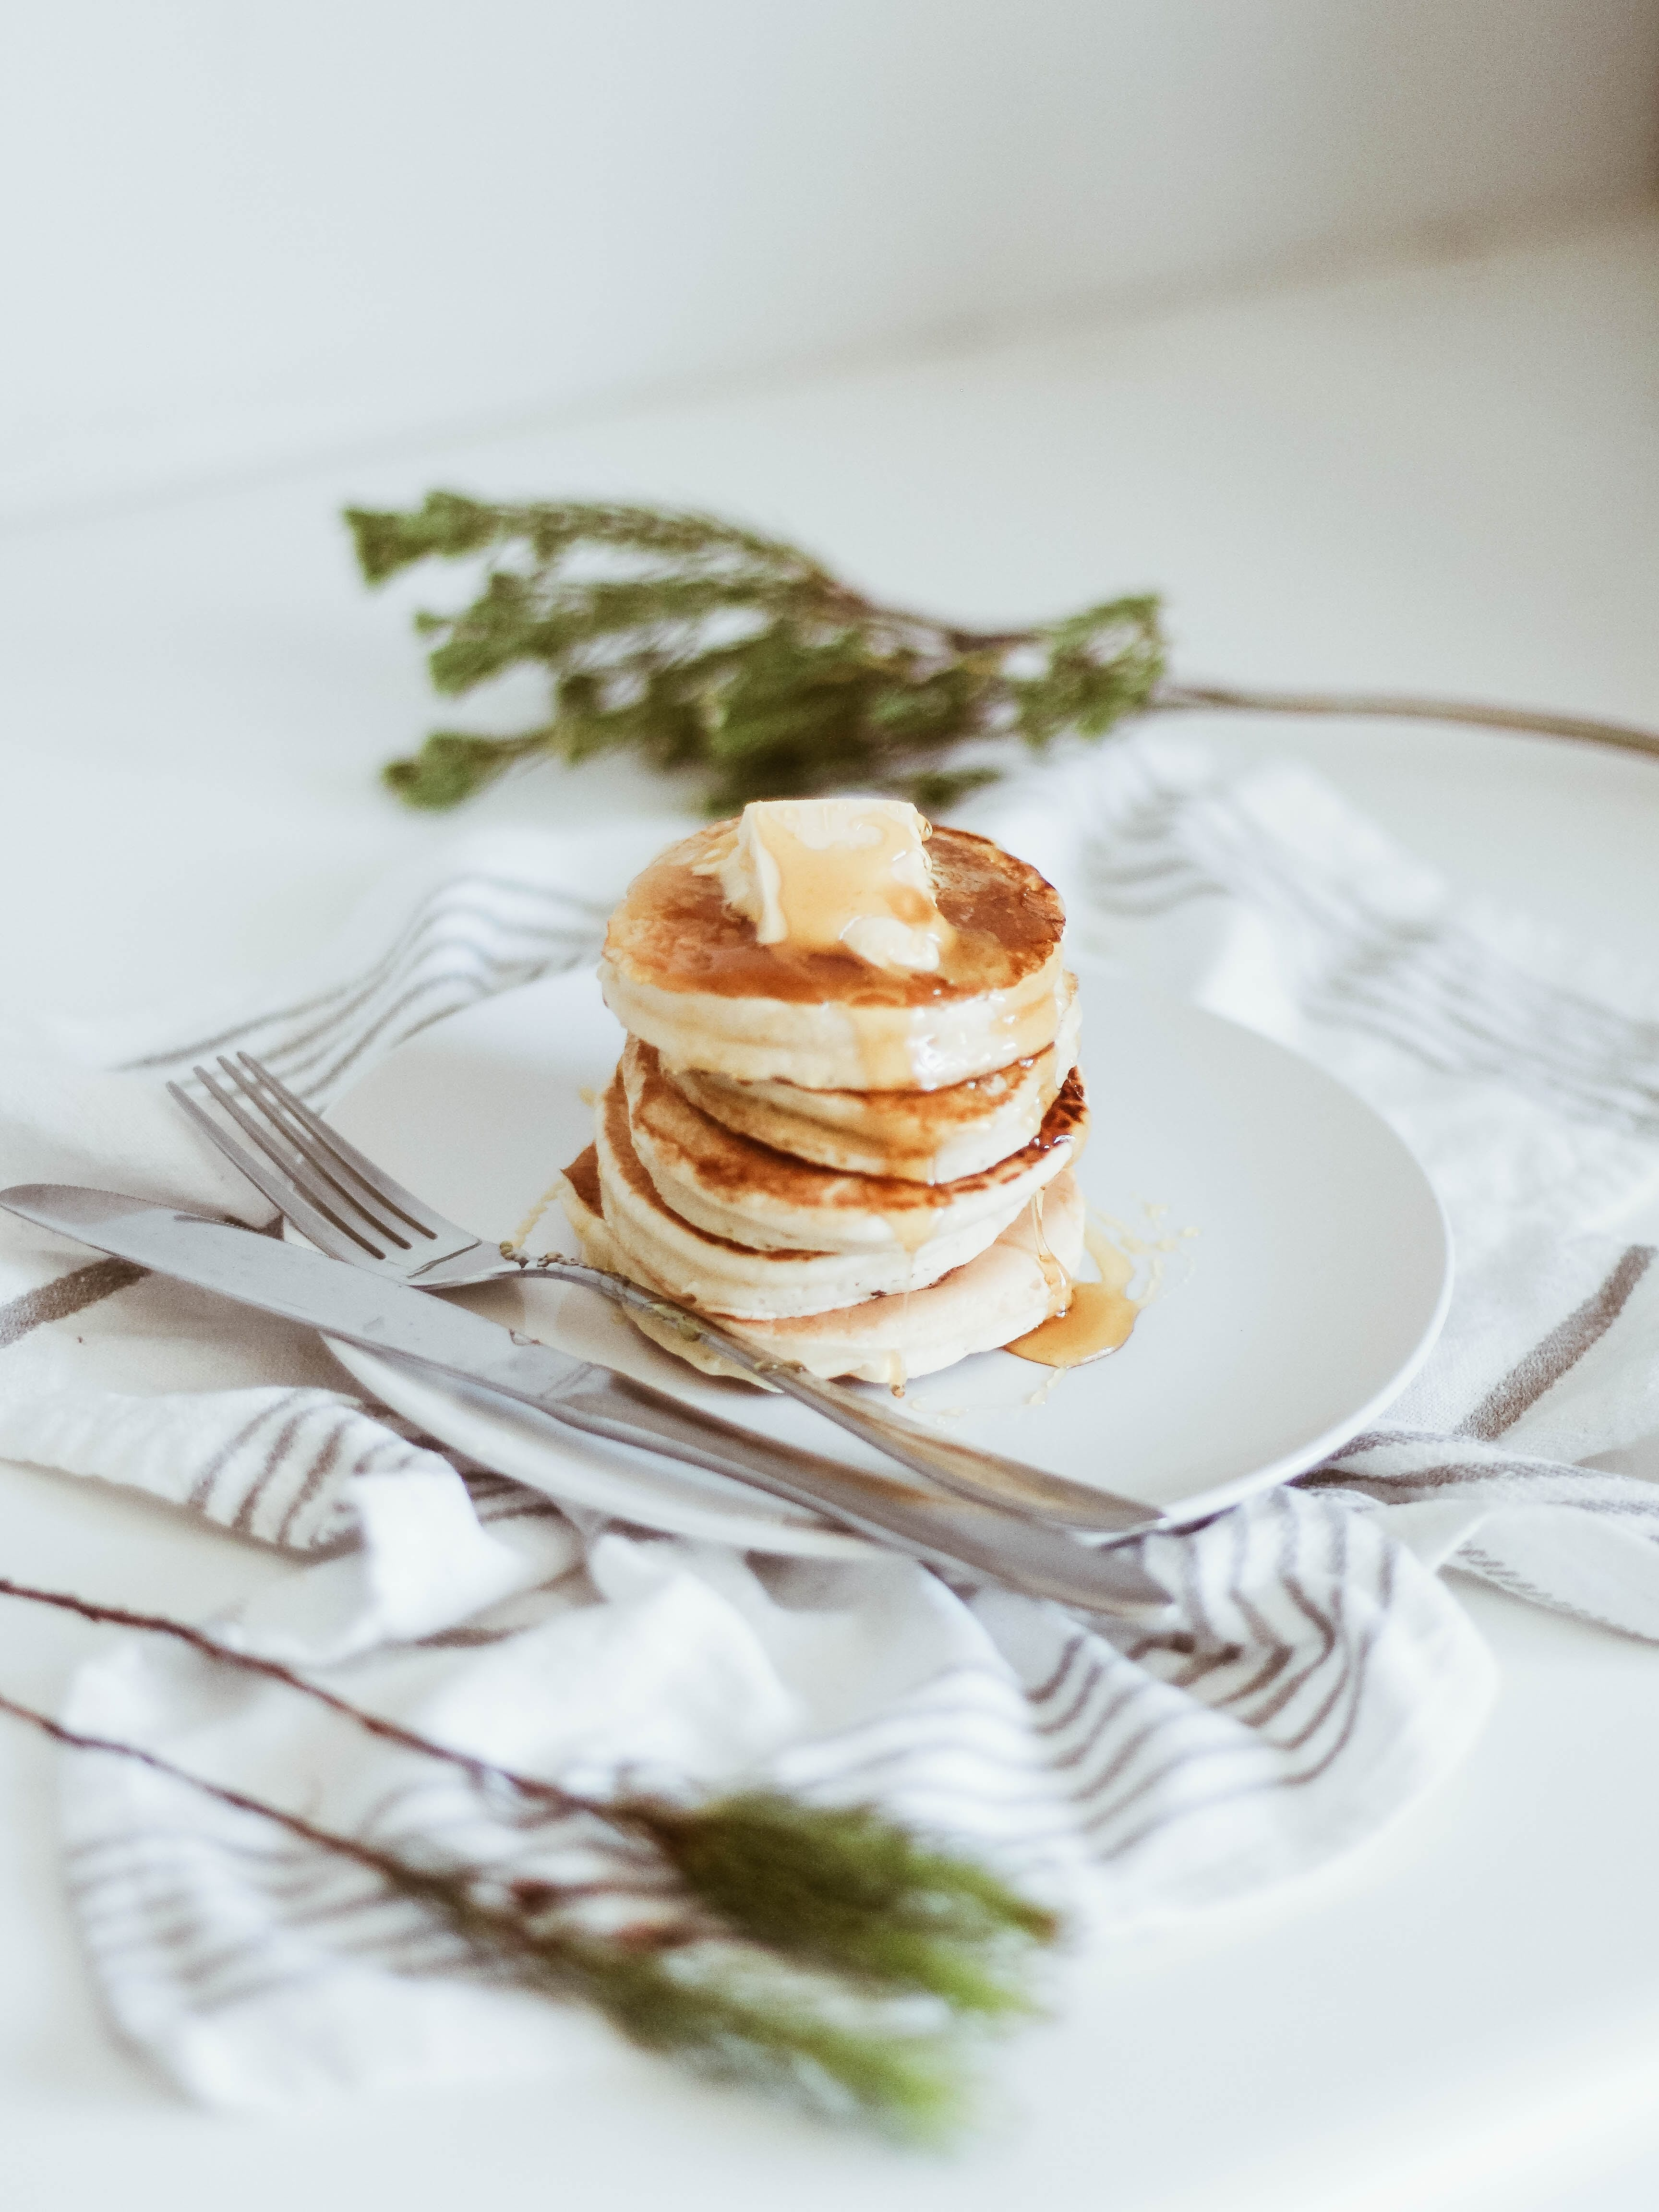 Myprotein高蛋白煎饼秘笈 | 一起打造你的高型格早餐